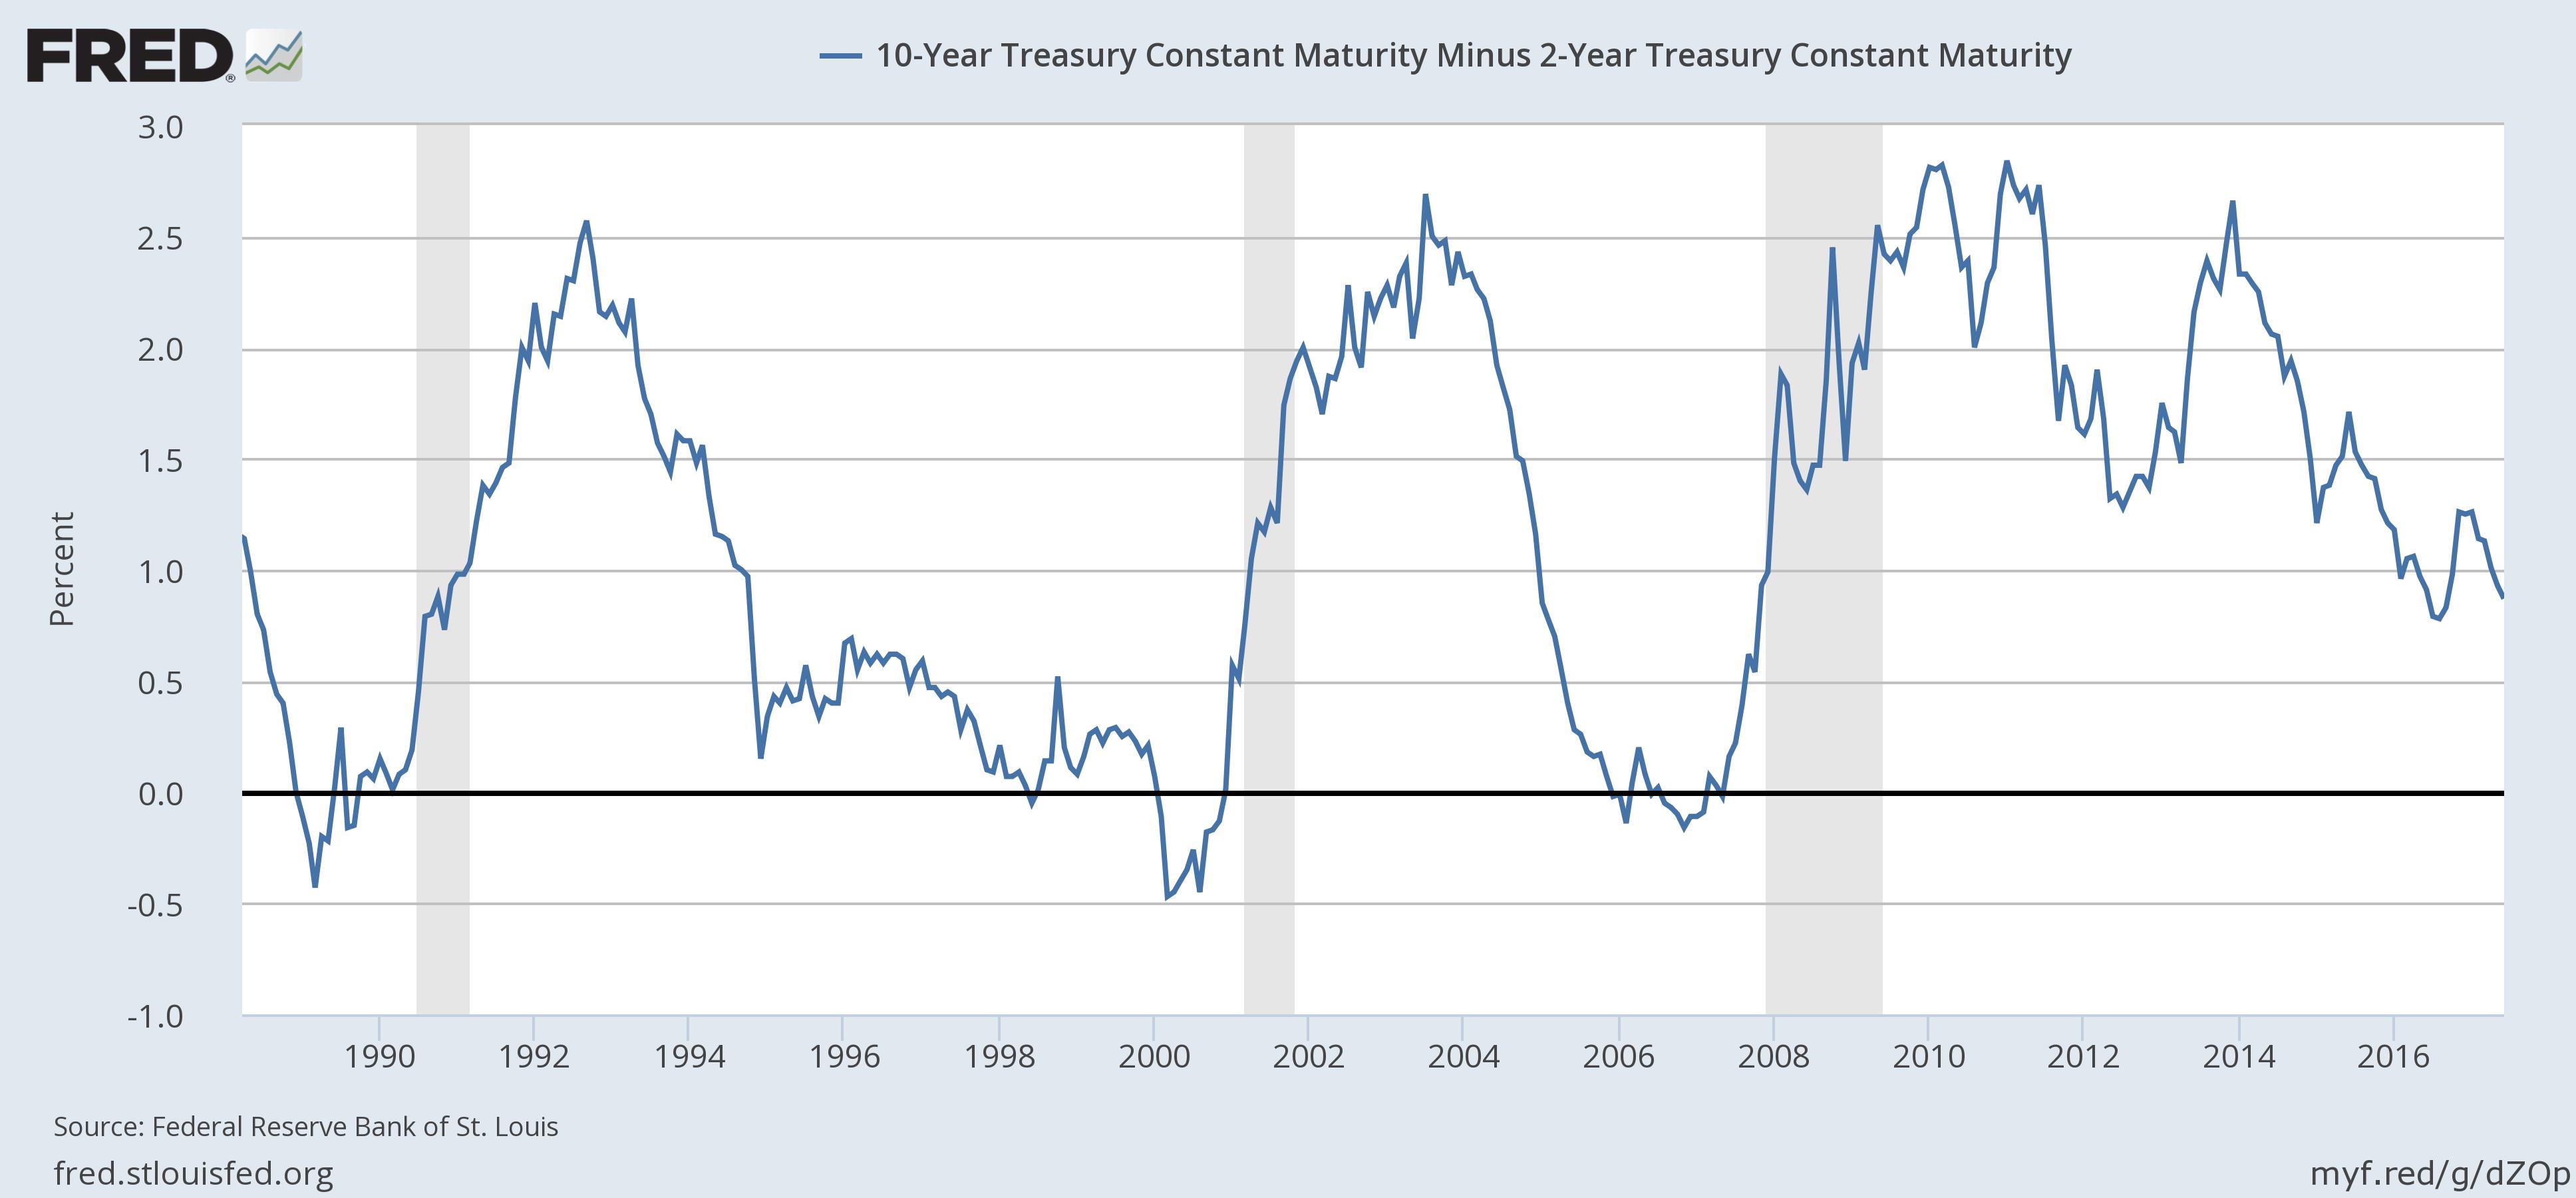 10-Year Treasury Constant Maturity Minus 2-Year Treasury Constant Maturity, 1990 - 2017